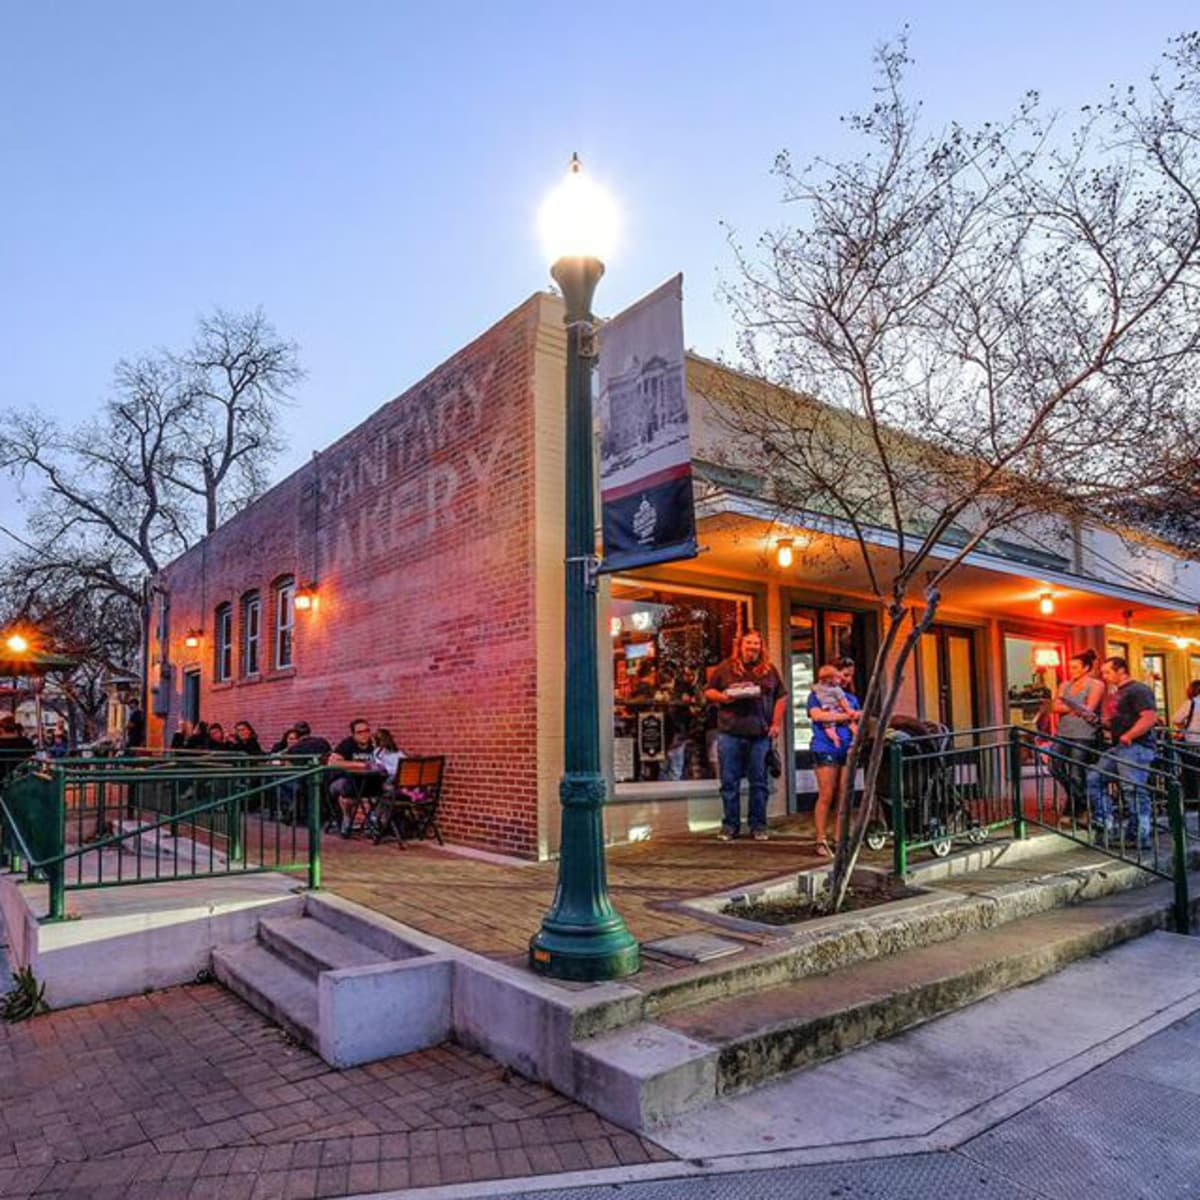 City of Georgetown, Texas